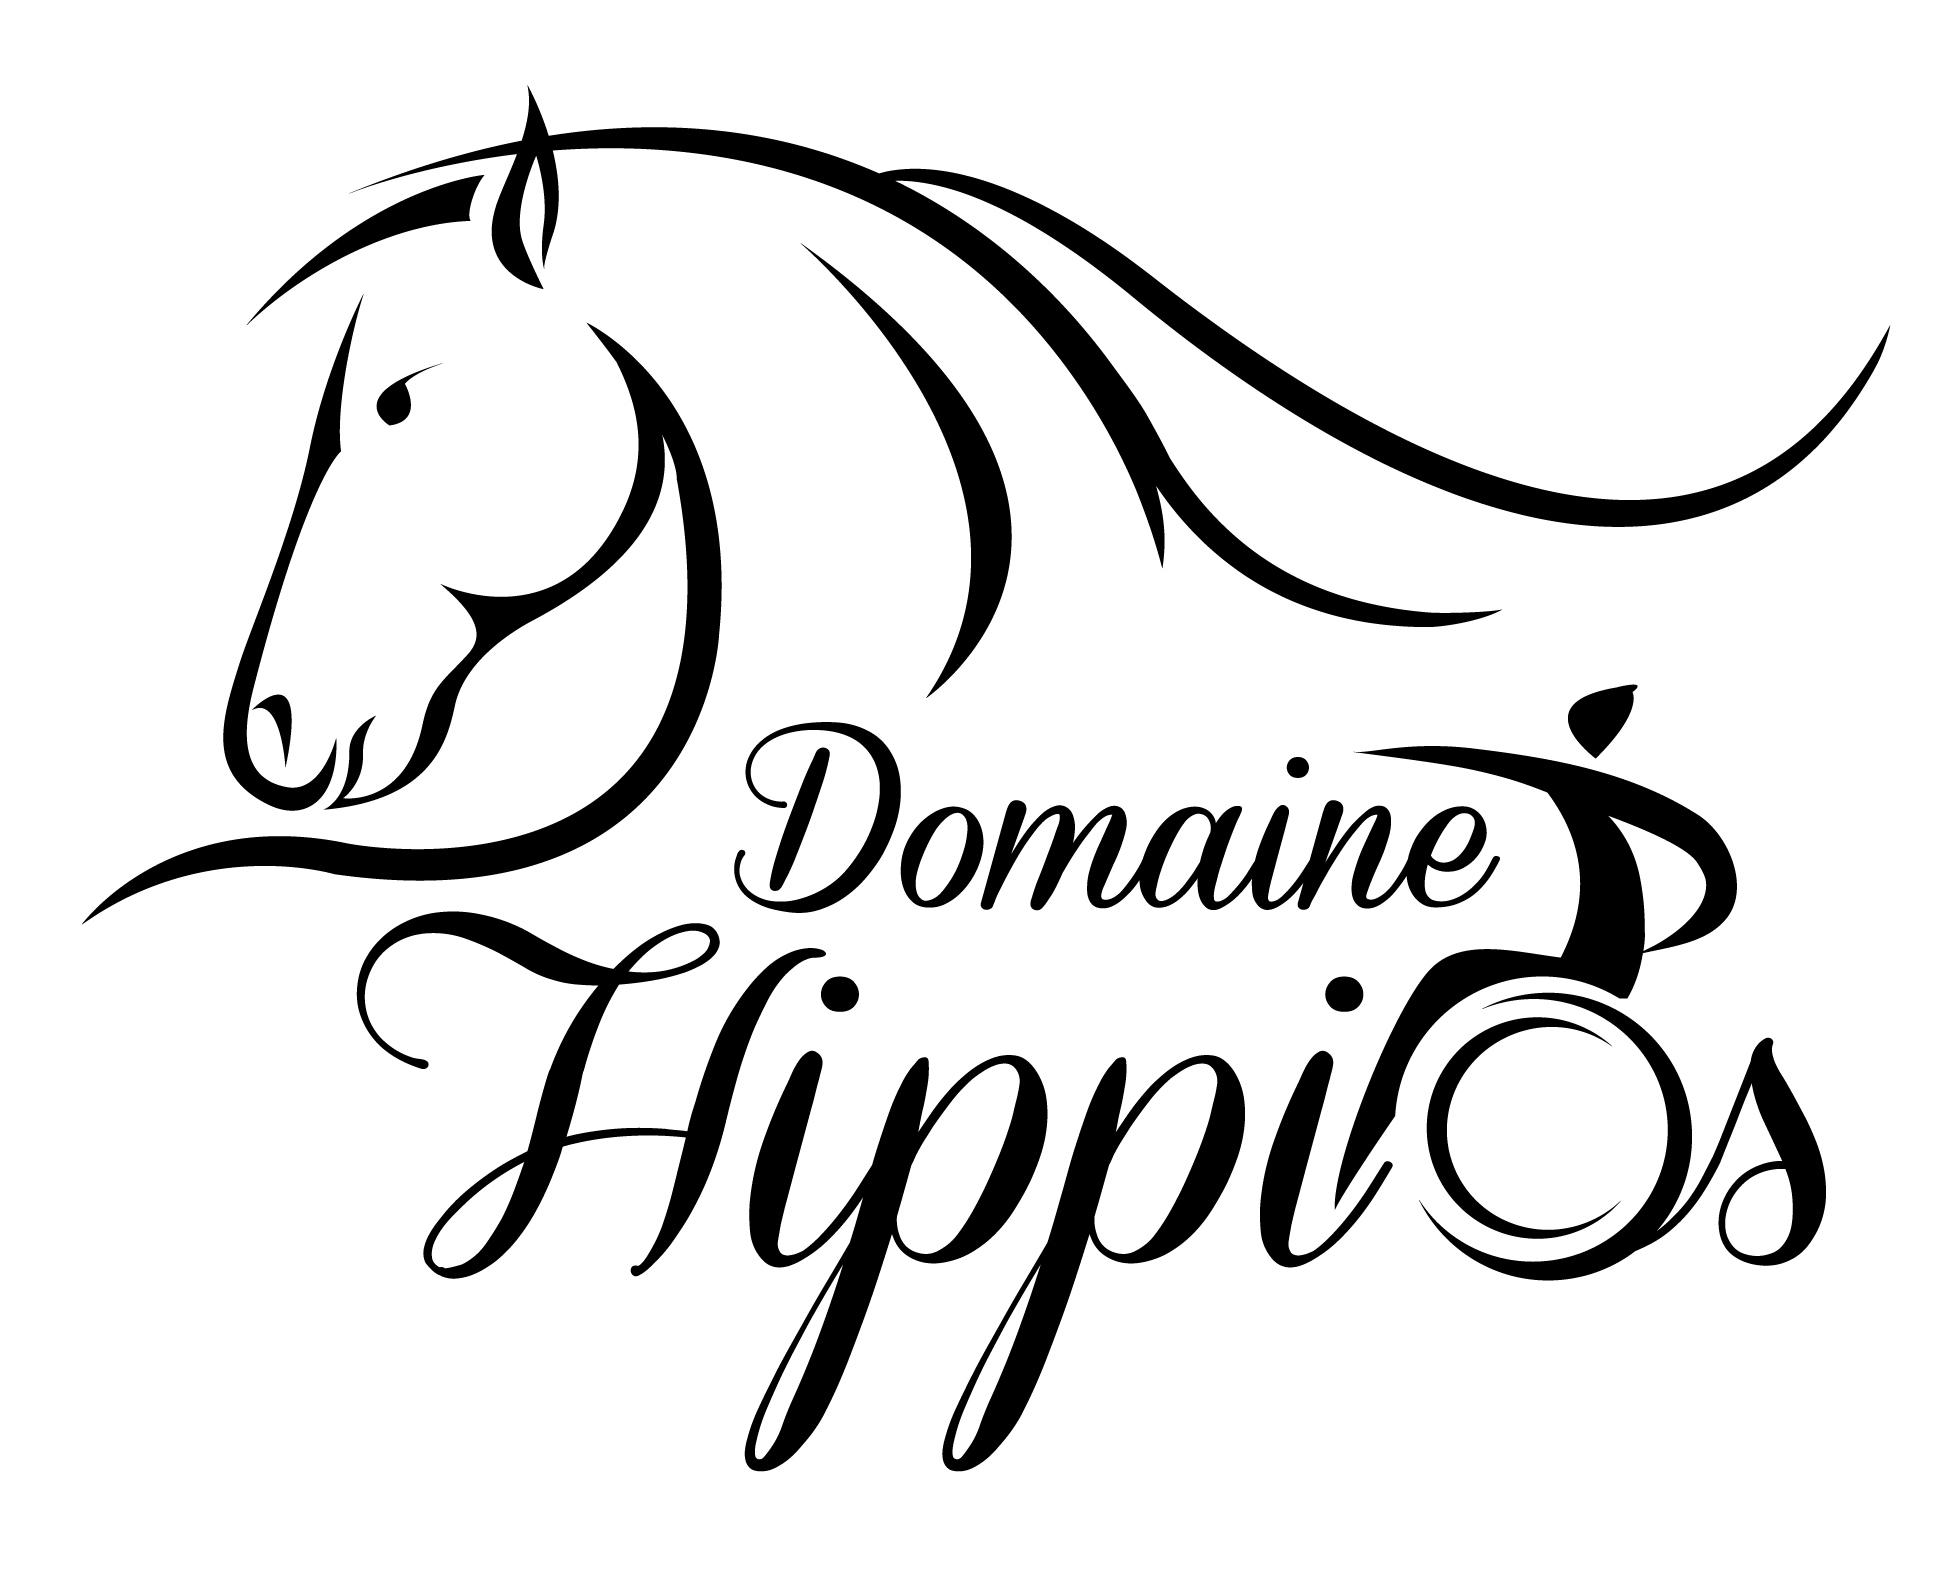 DOMAINE D'HIPPIOS